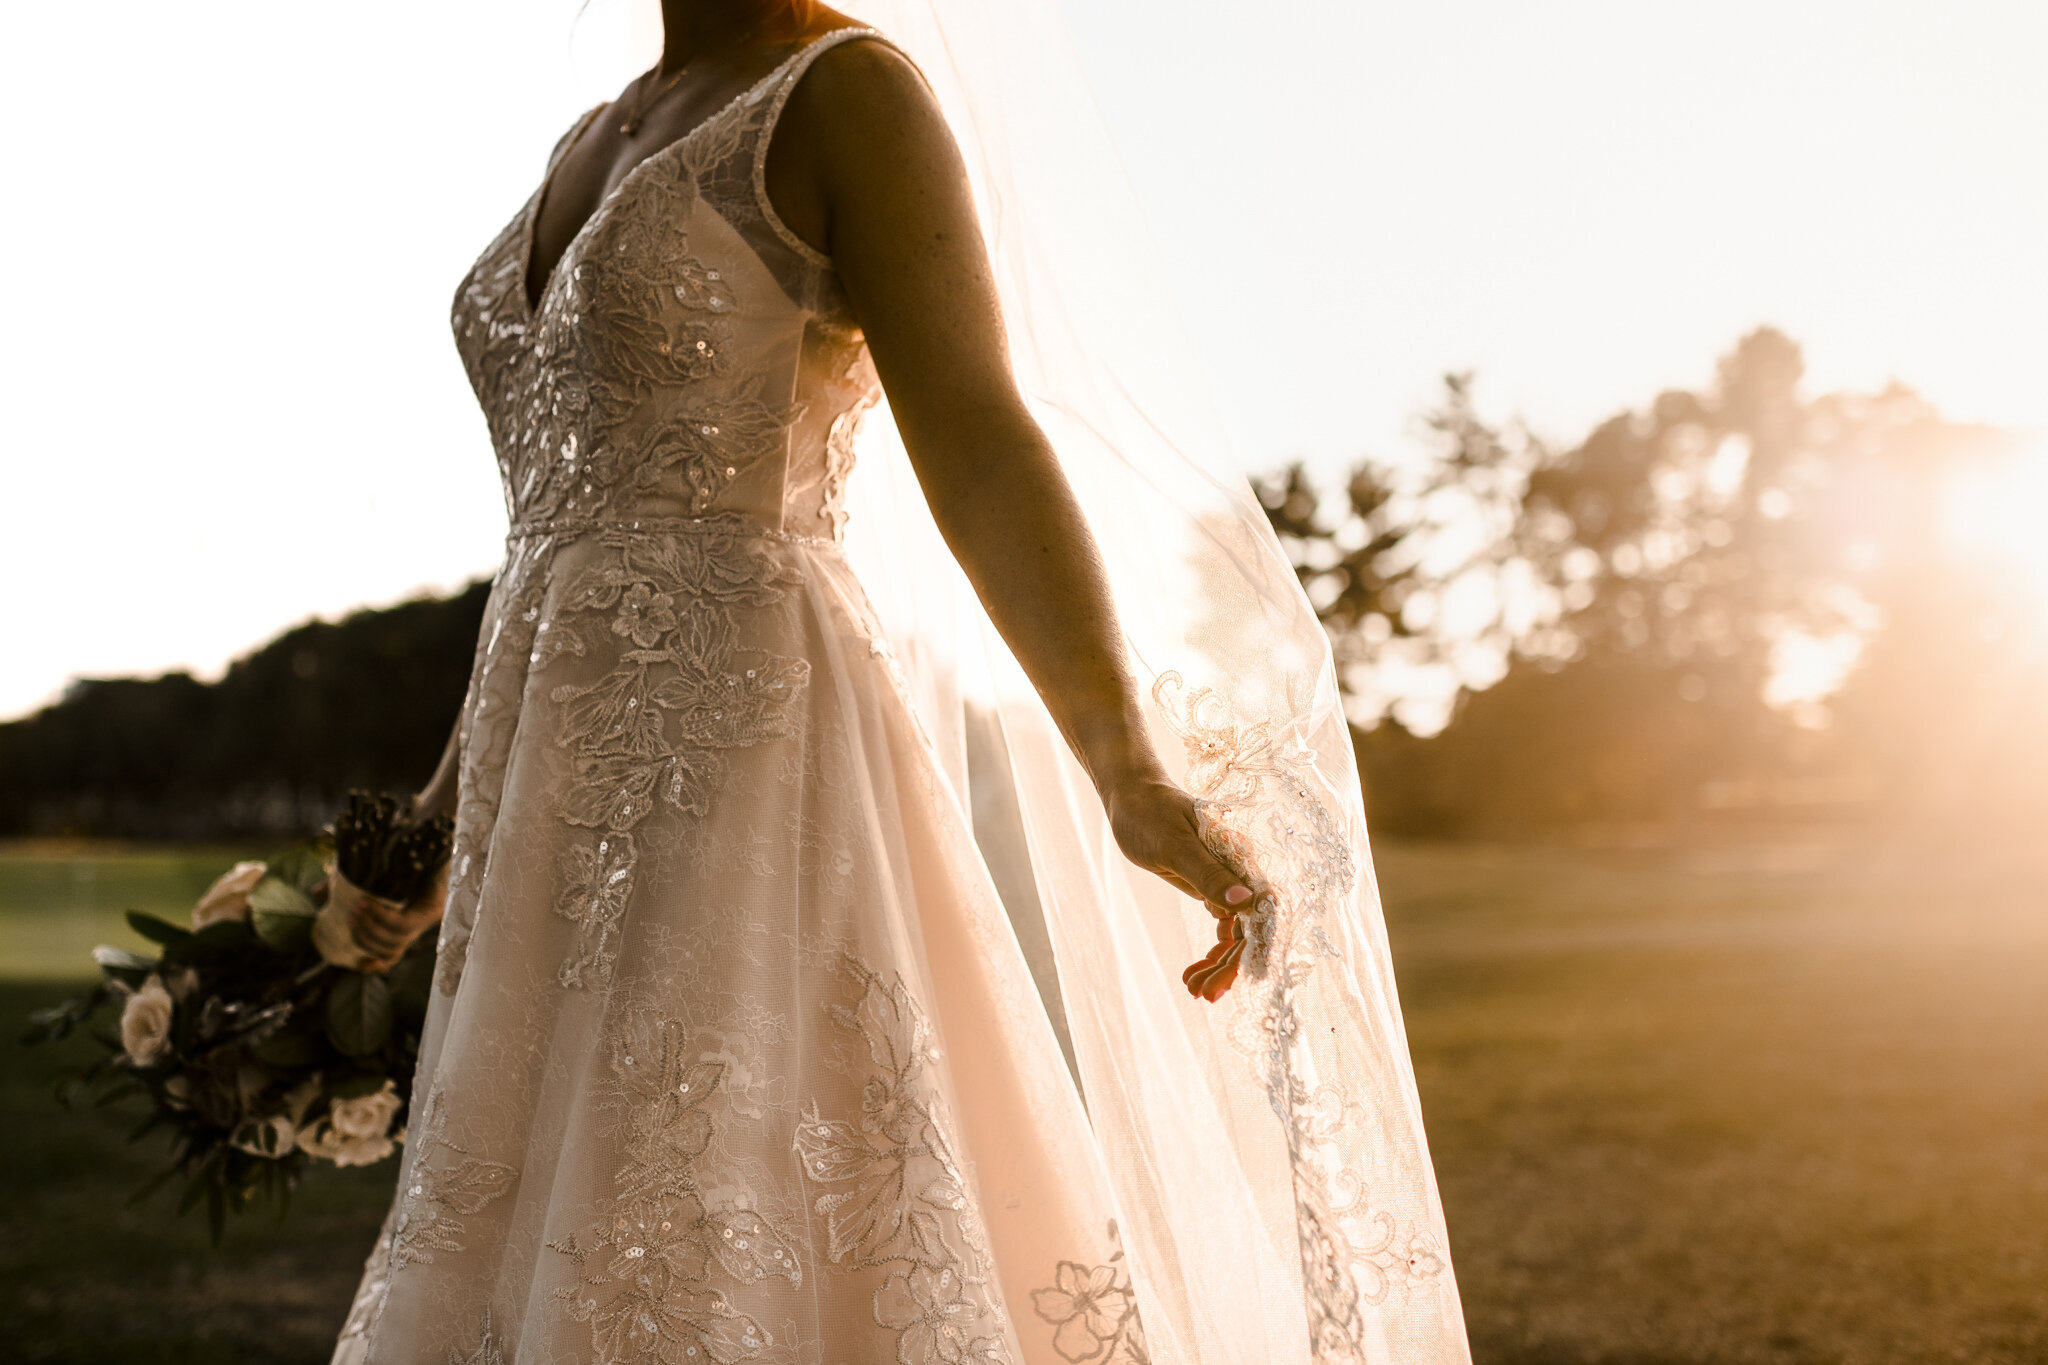 Coyle-Forsgate-Country-Club-Wedding-Photographer-19.JPG